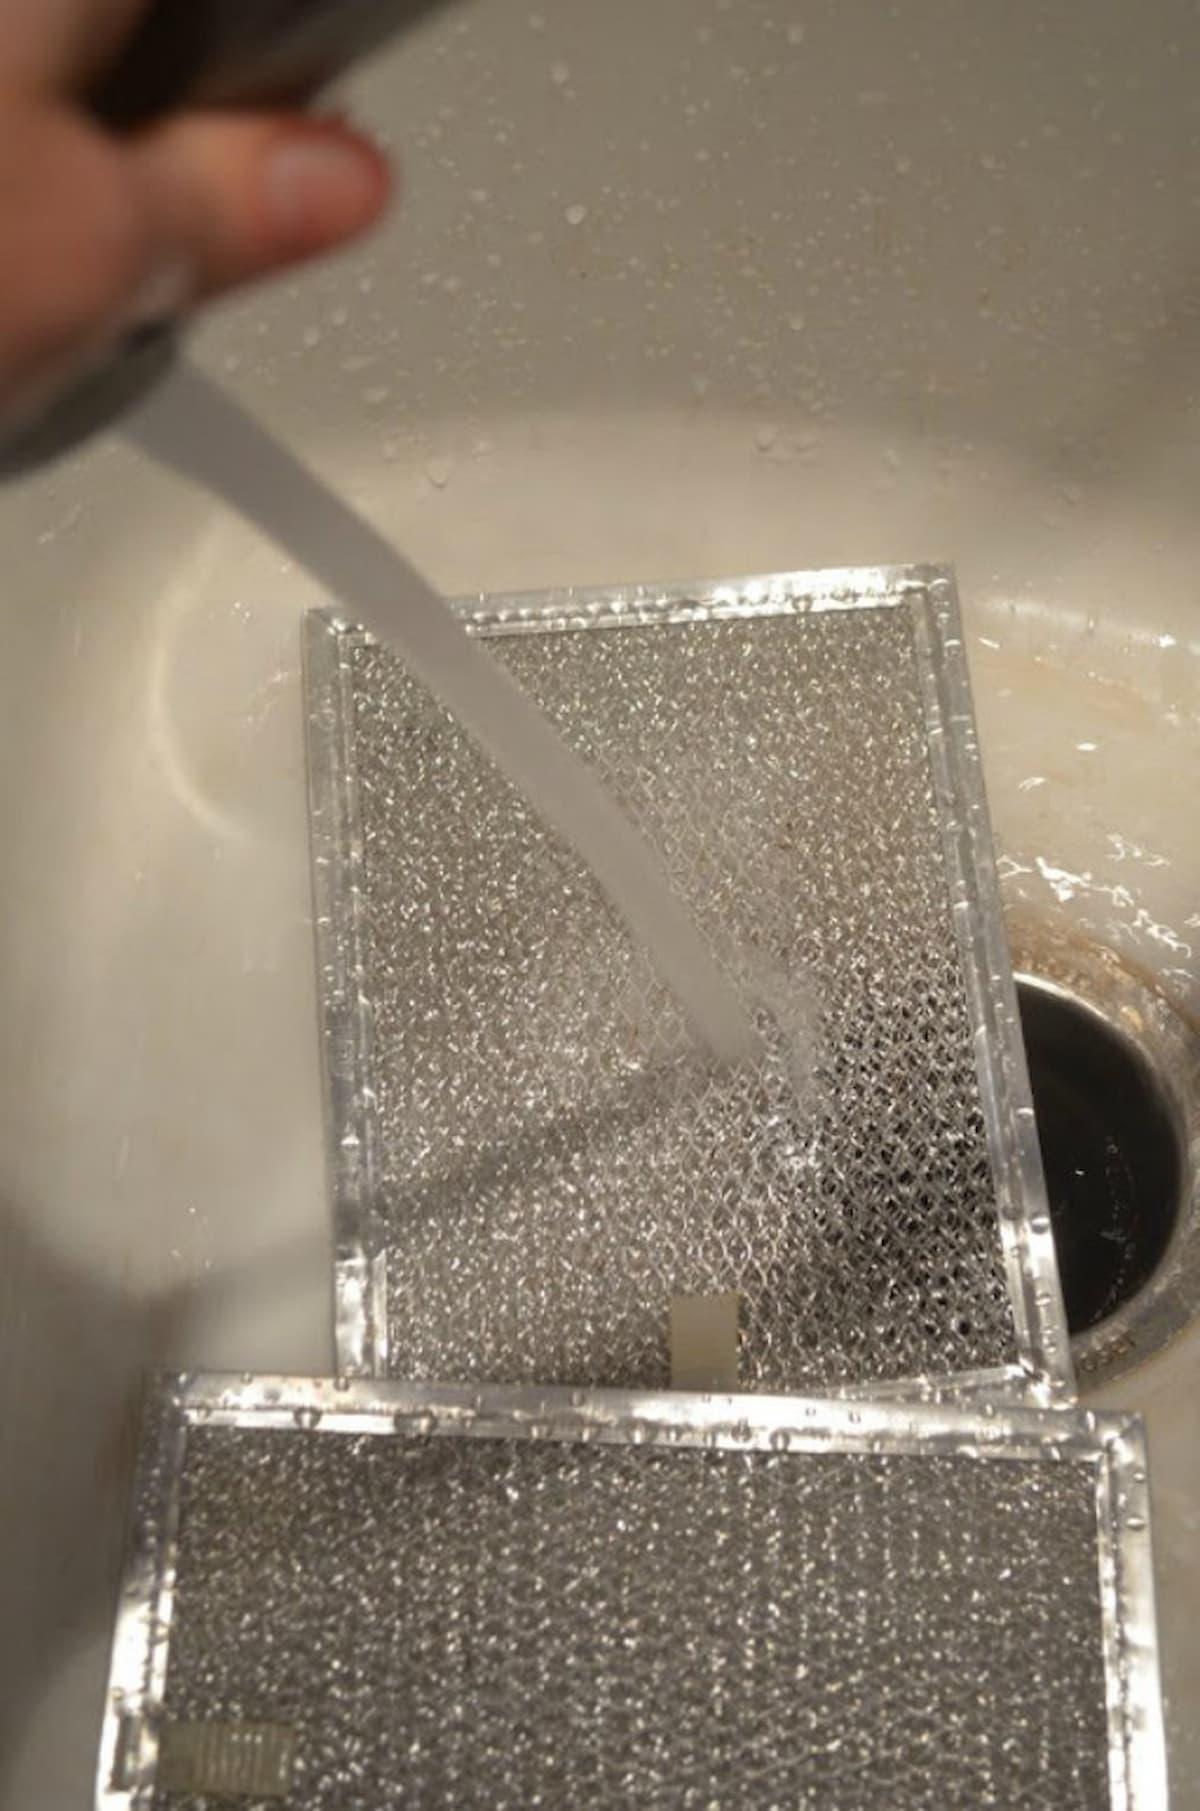 Clean Hood Vent Filter being rinsed under water.